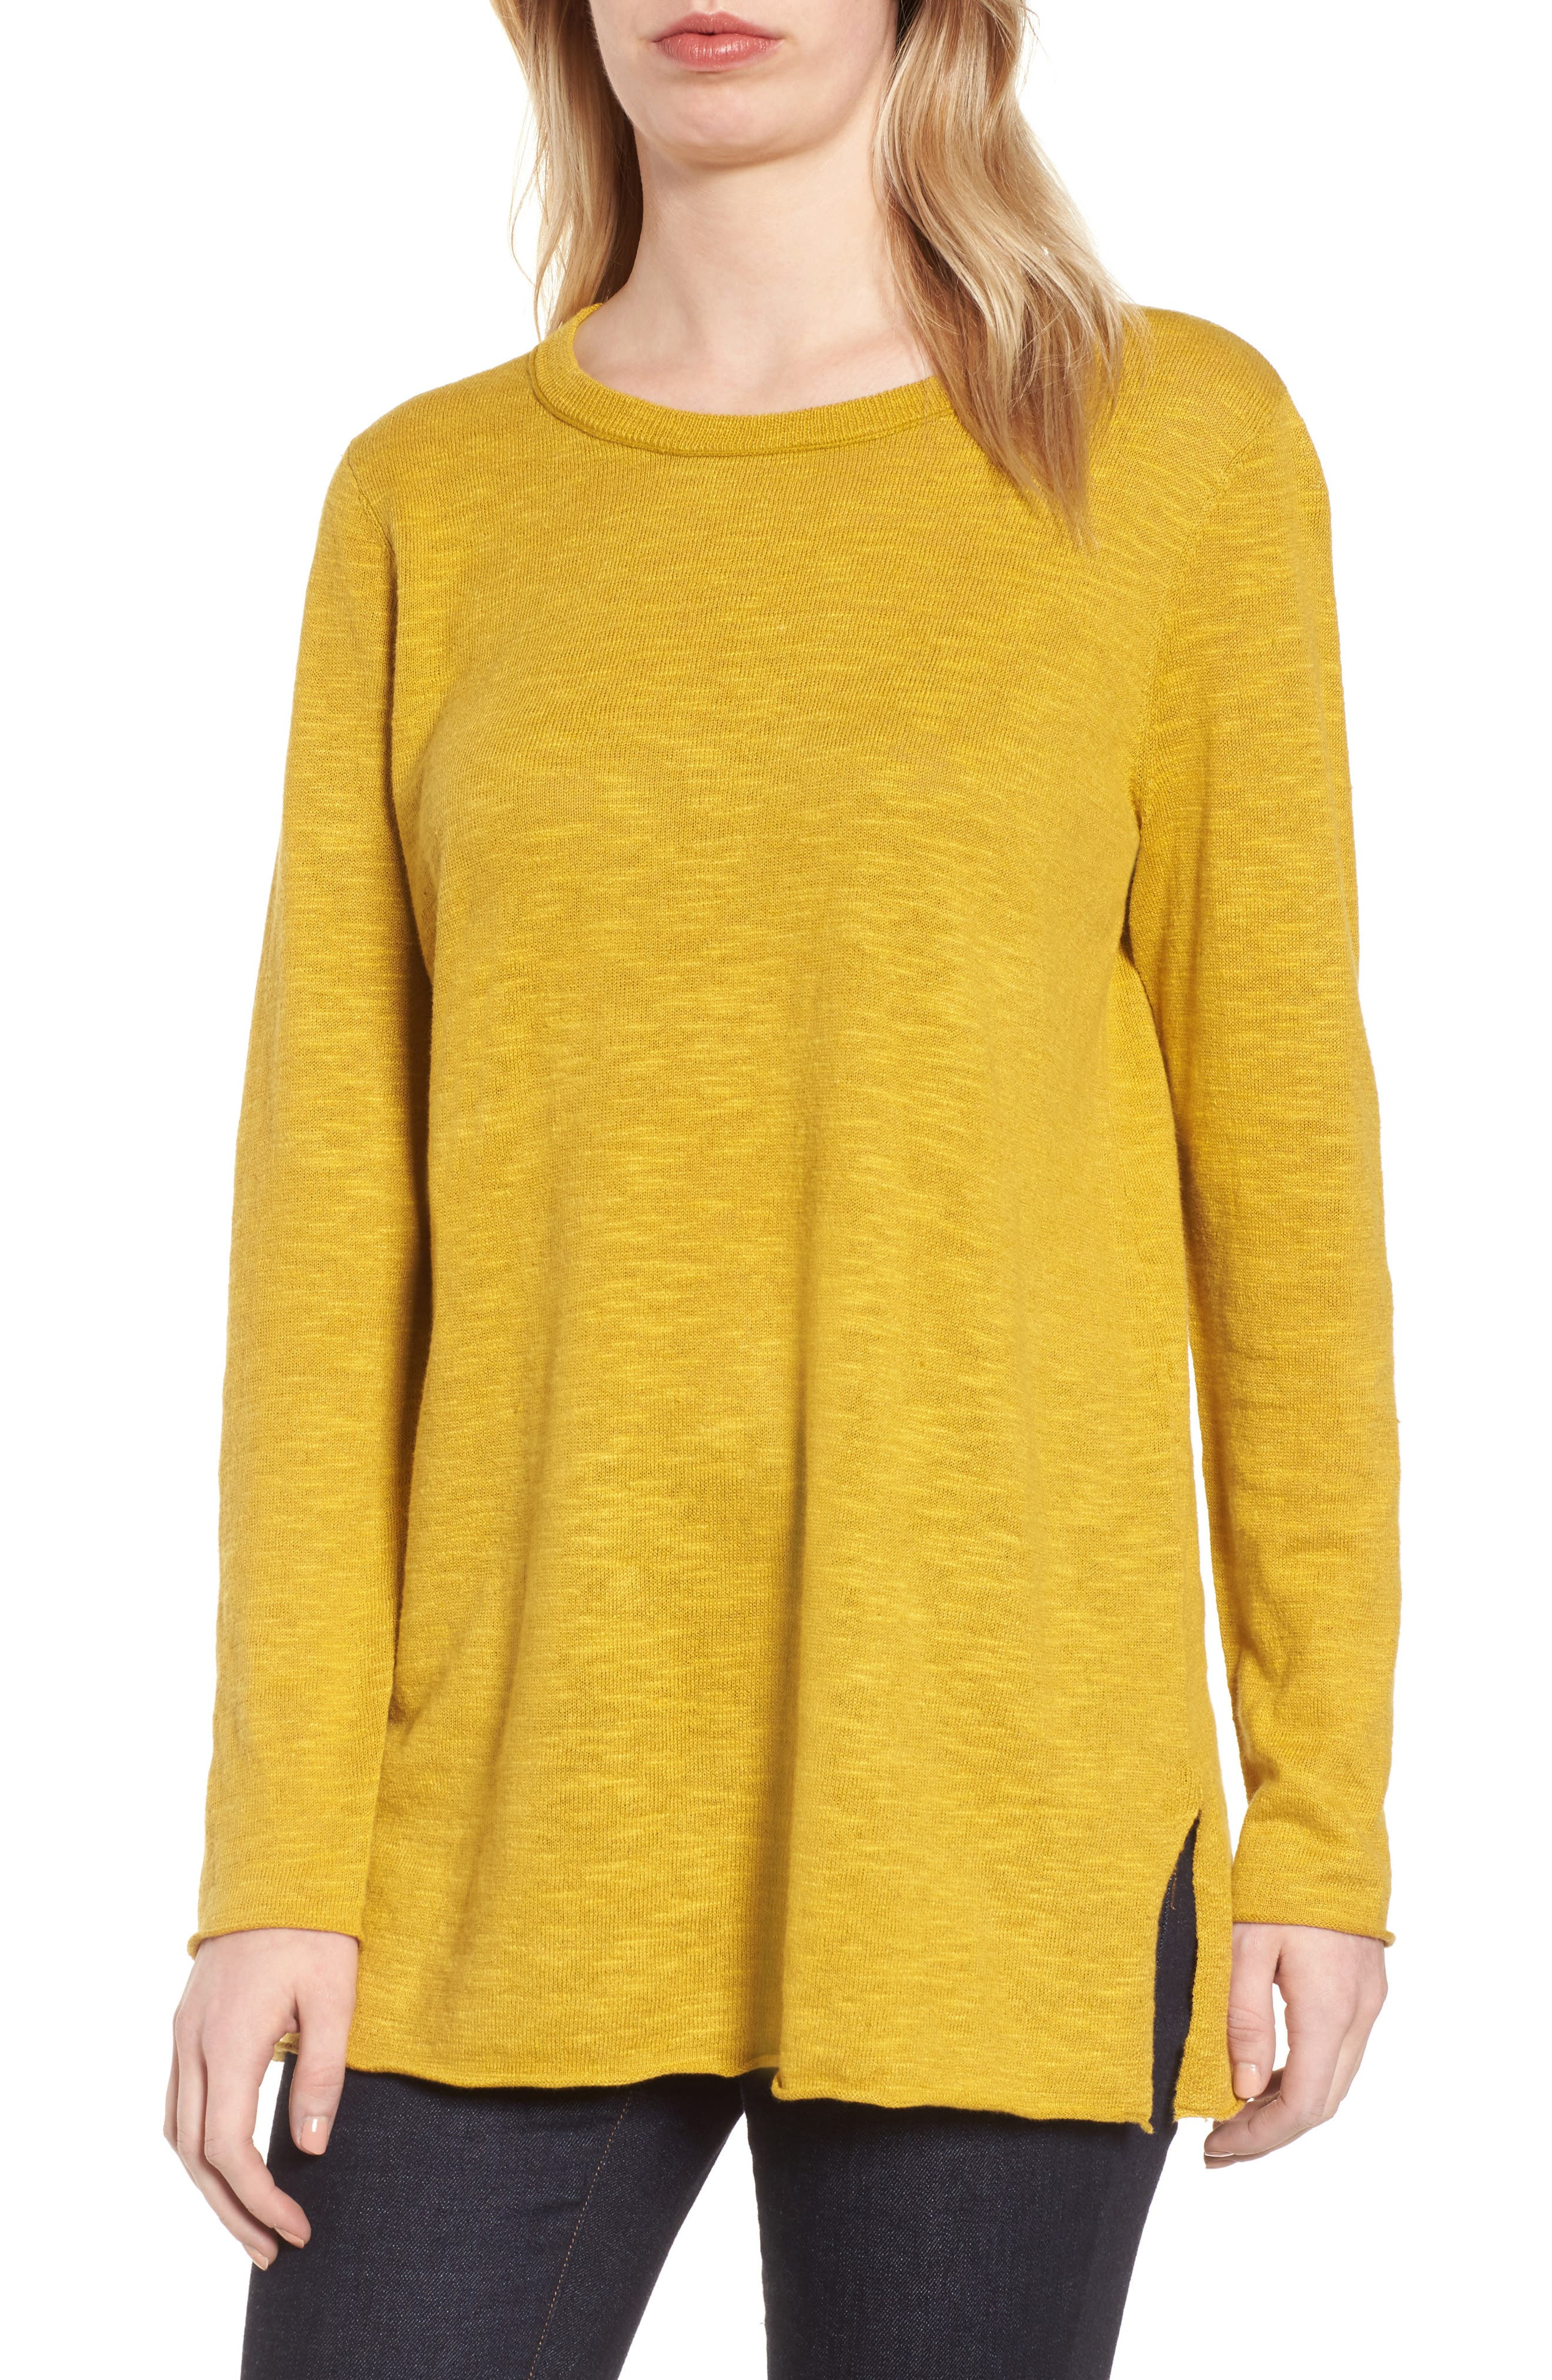 Organic Knit Crewneck Tunic Top,                             Main thumbnail 1, color,                             Mustard Seed